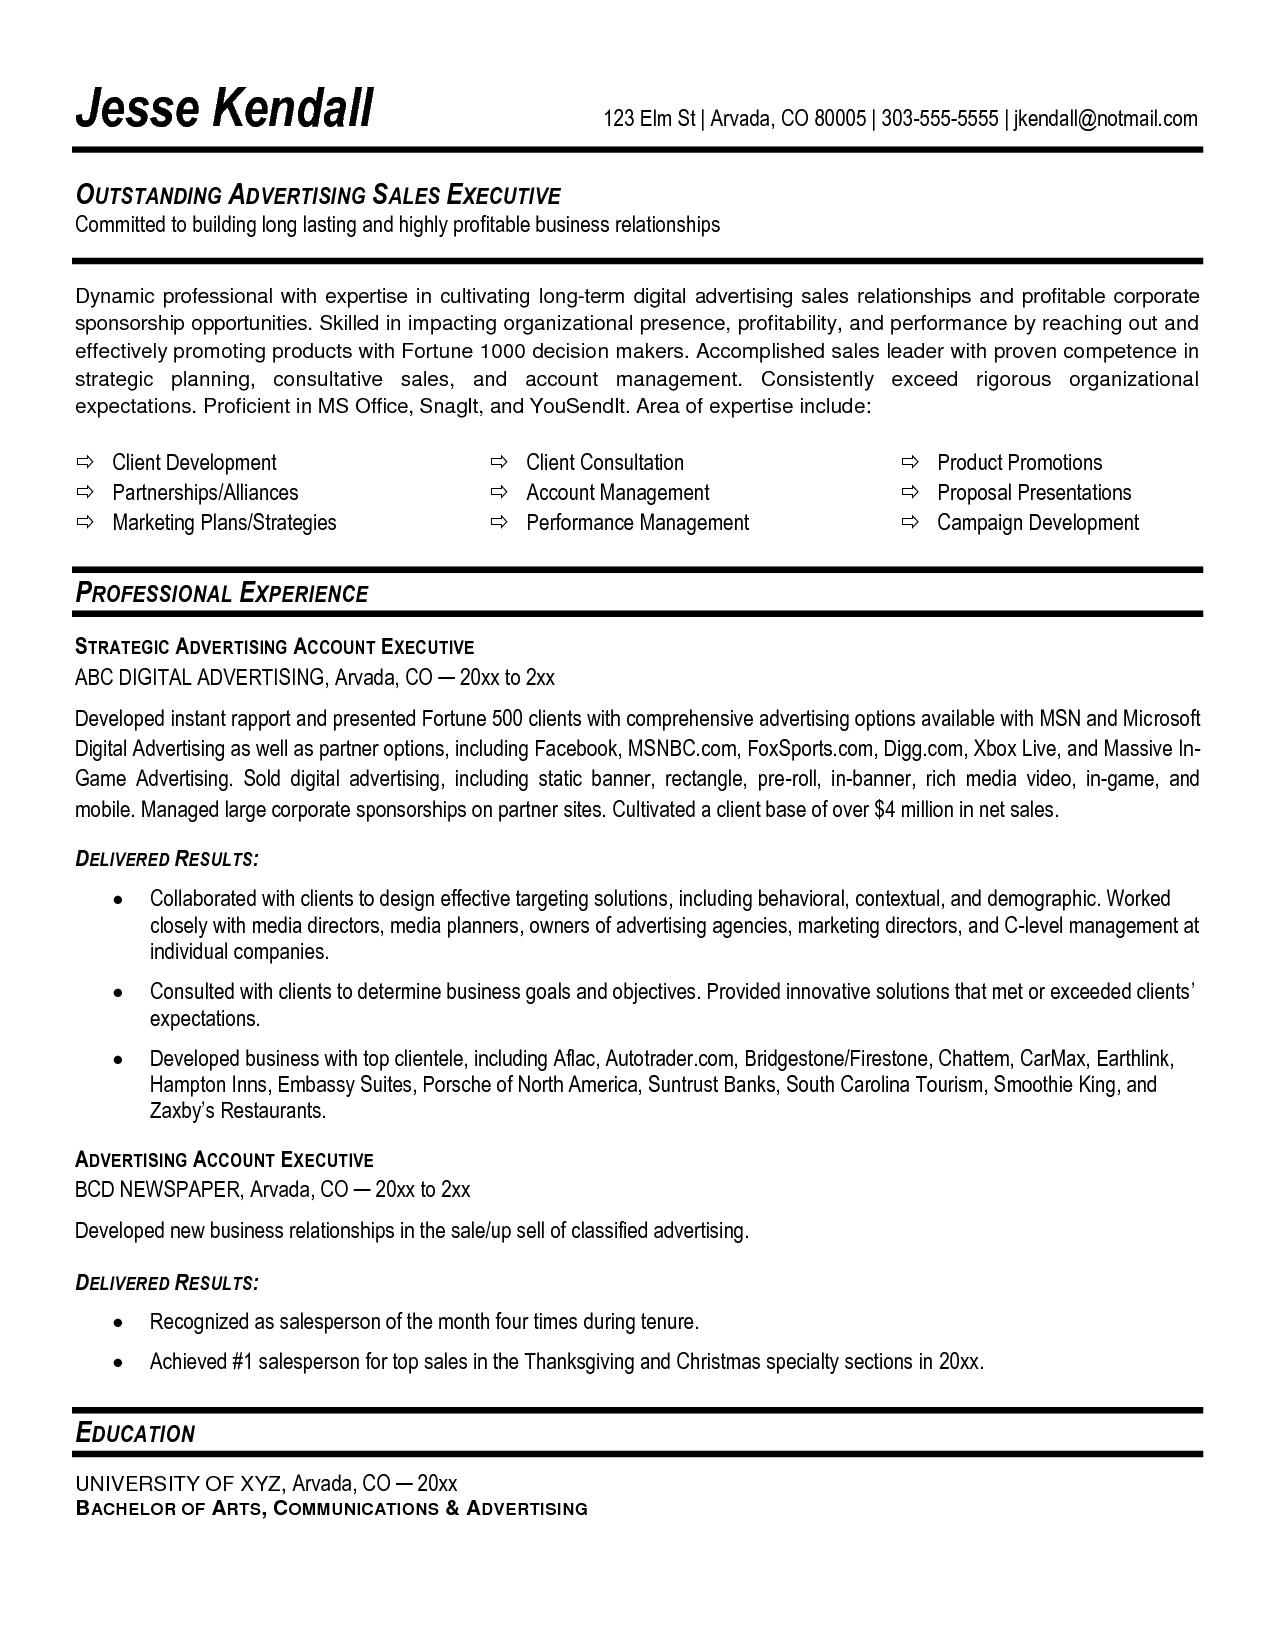 Excellent Resume Account Management Google Search Job